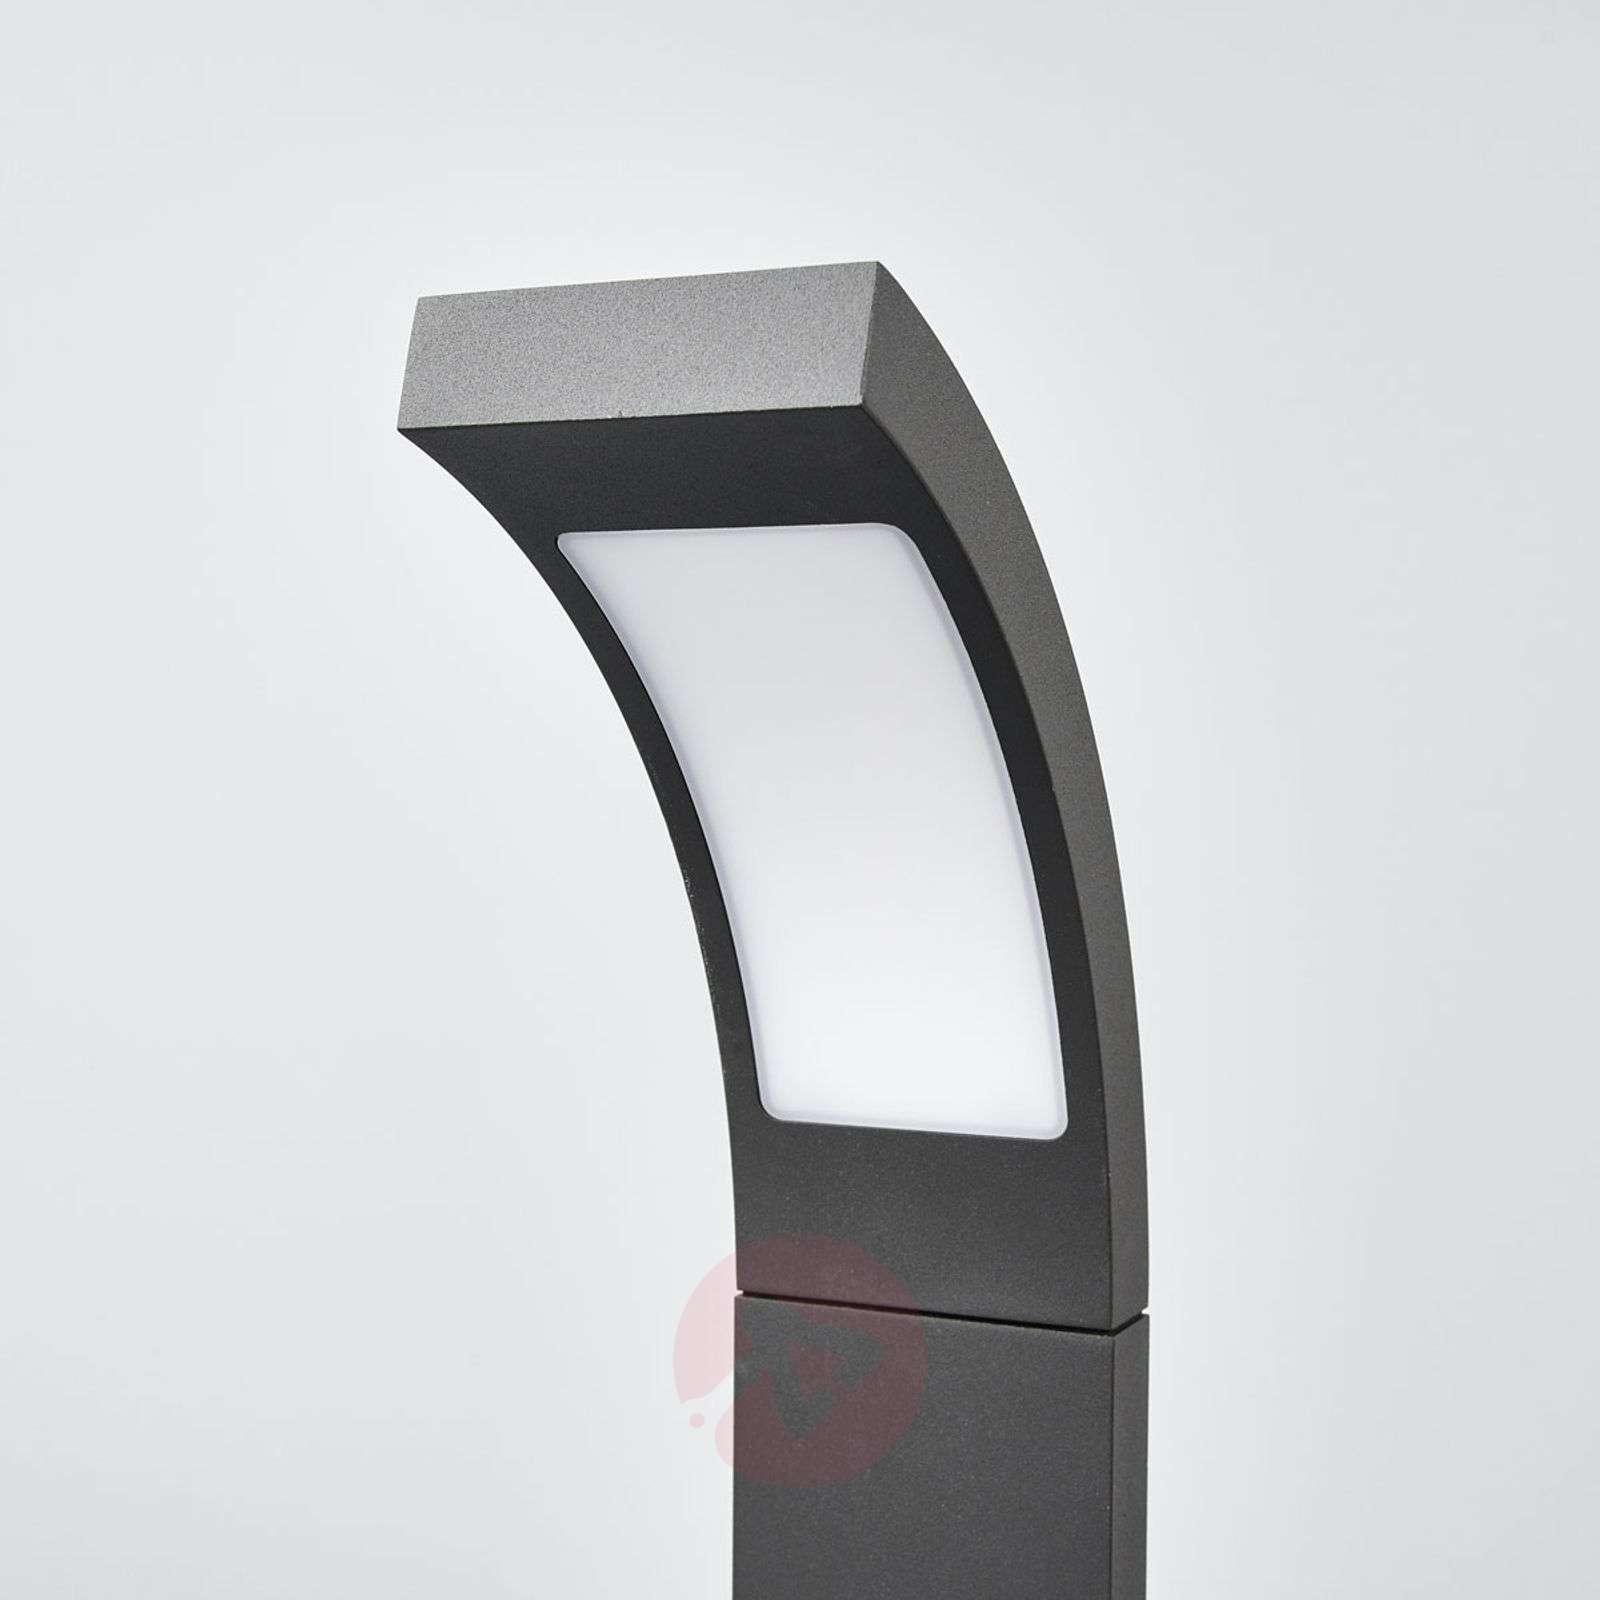 Juvia modern LED pillar light in graphite grey | Lights.ie for Modern Pillar Lights  156eri